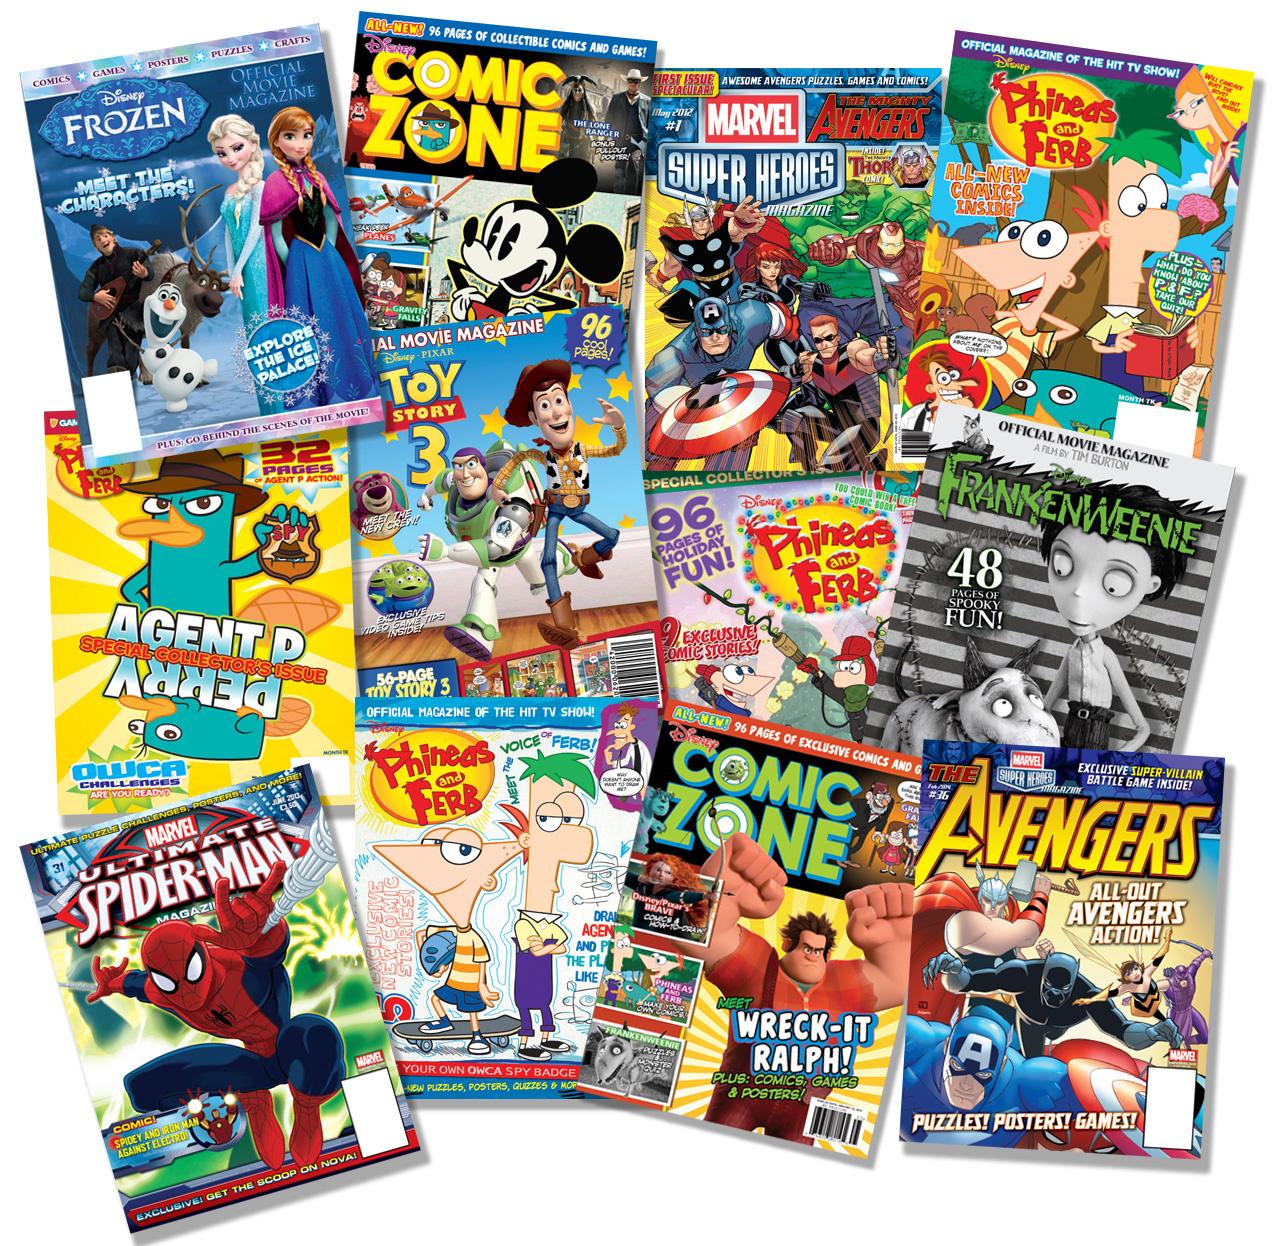 DISNEY WORLDWIDE PUBLISHING